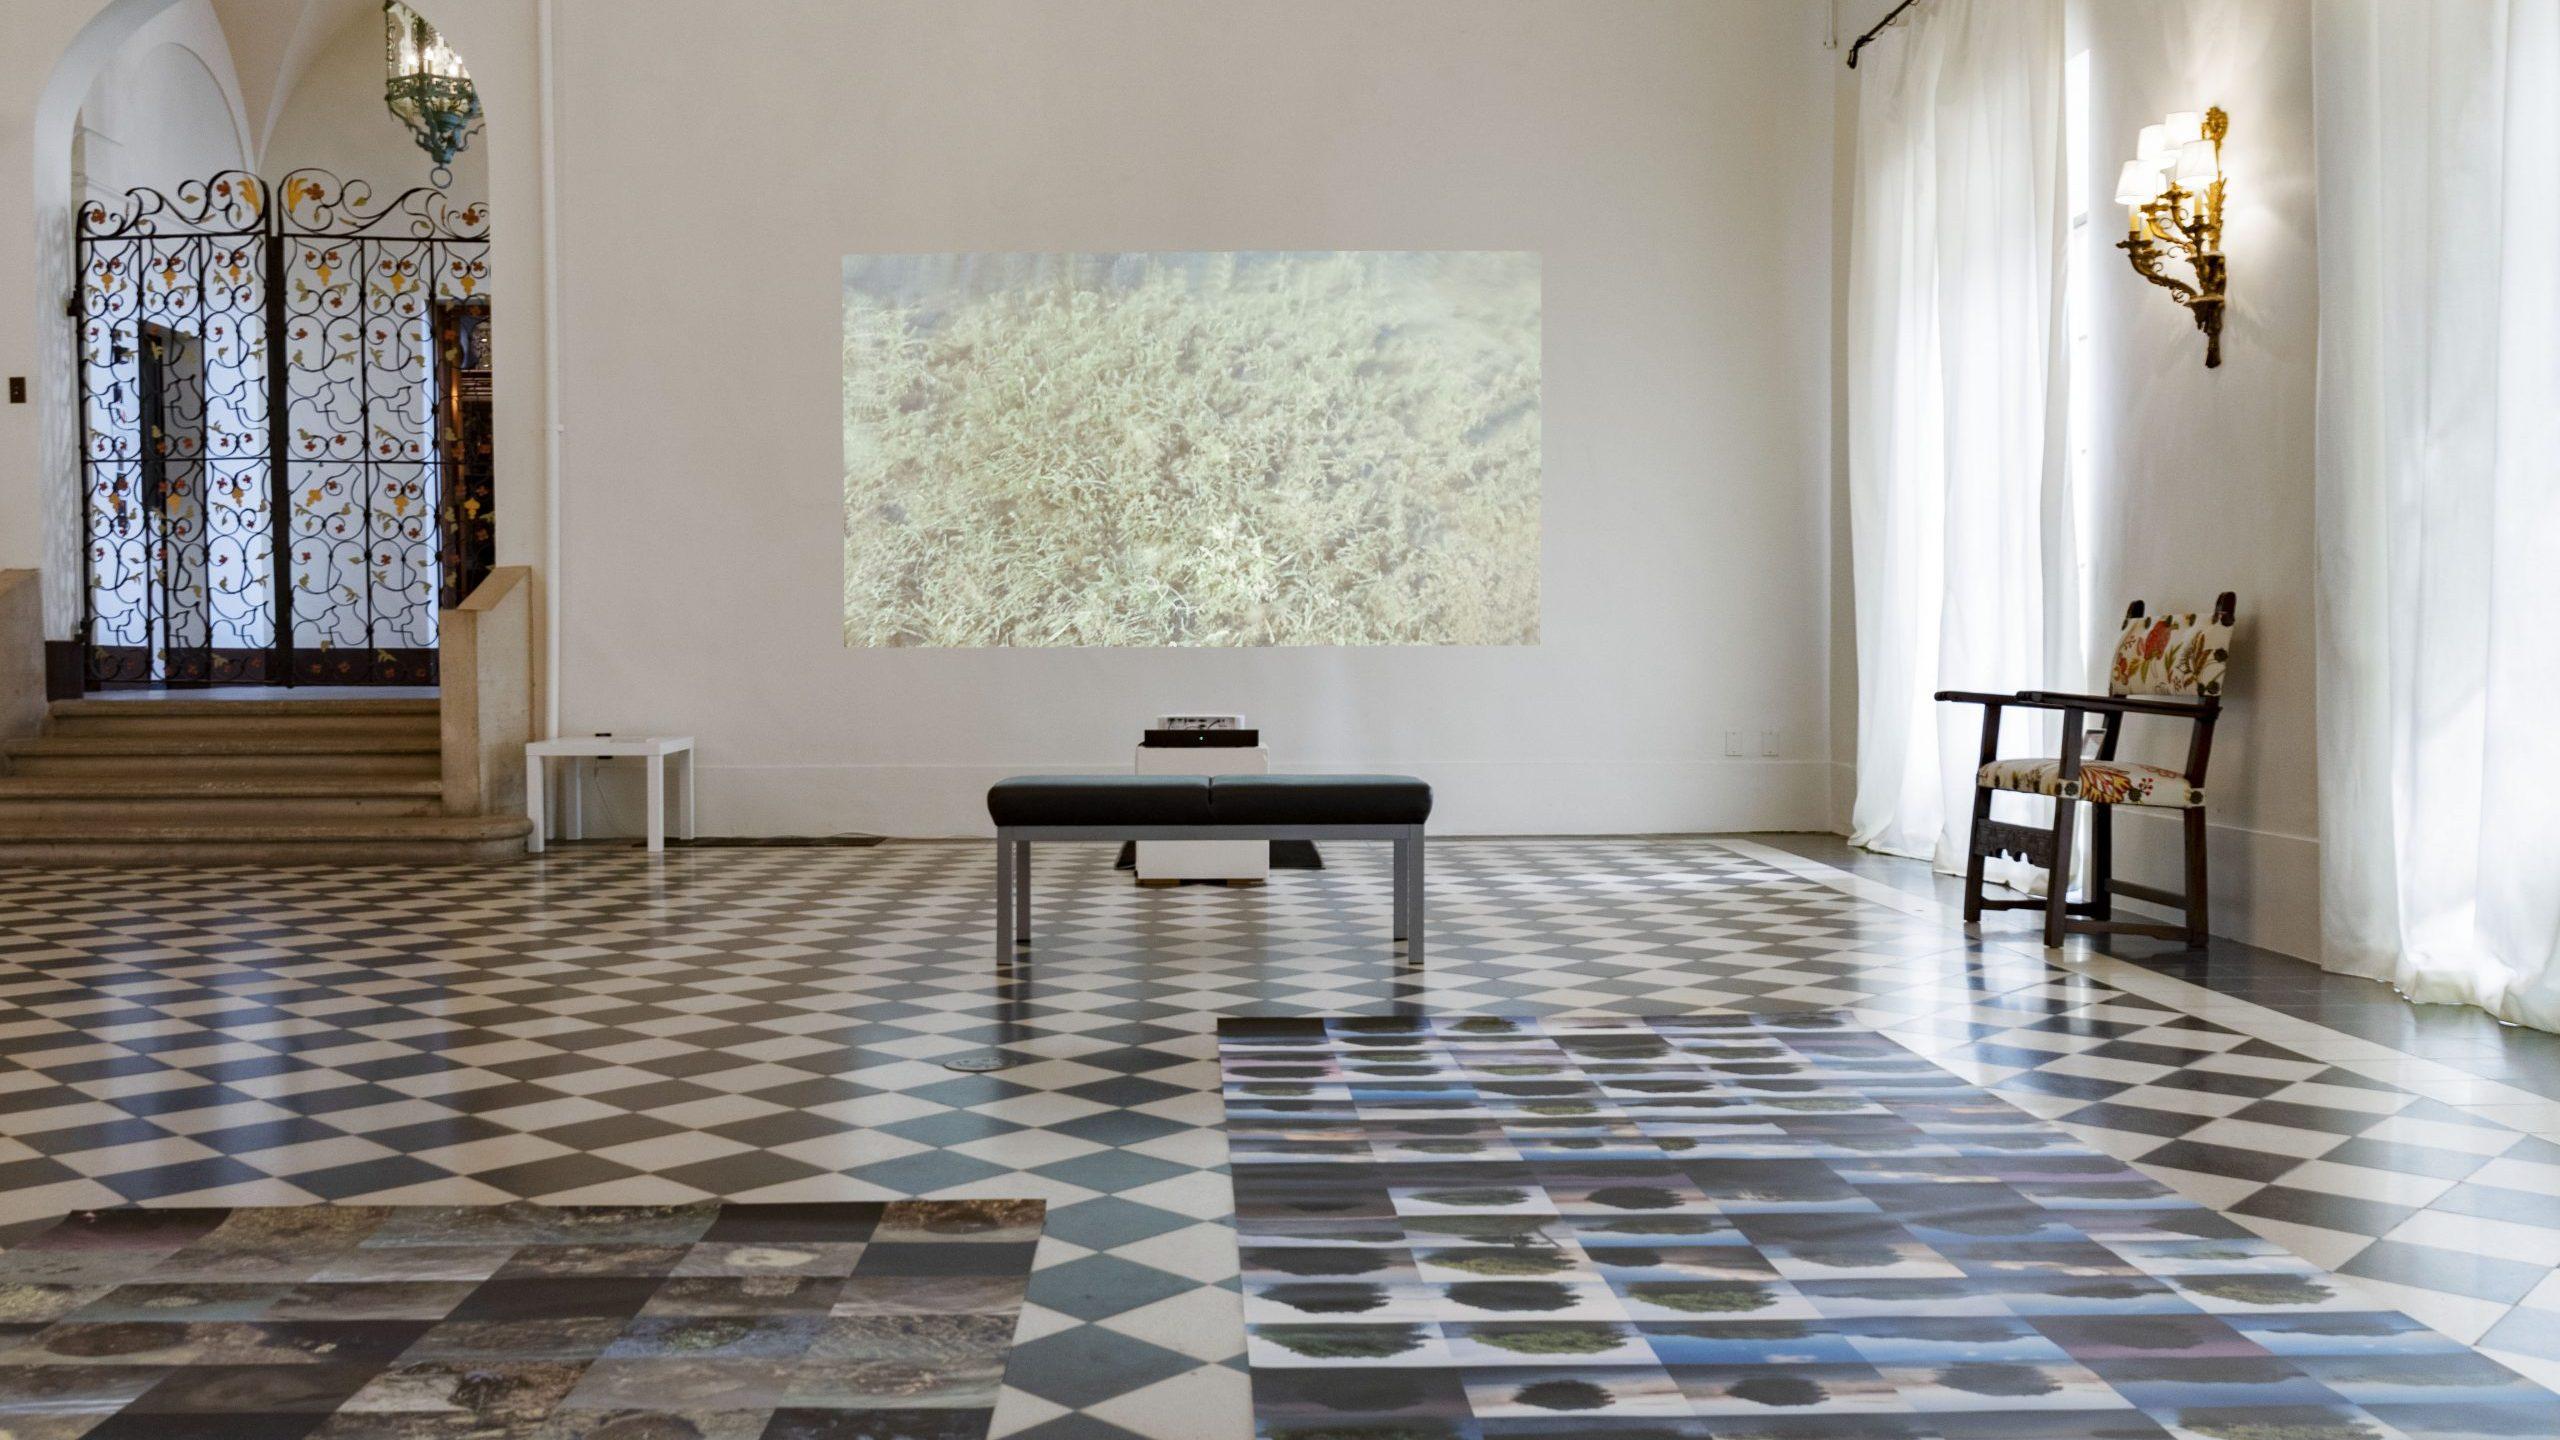 Amalia Caputo Art Gallery Inside the Stone House